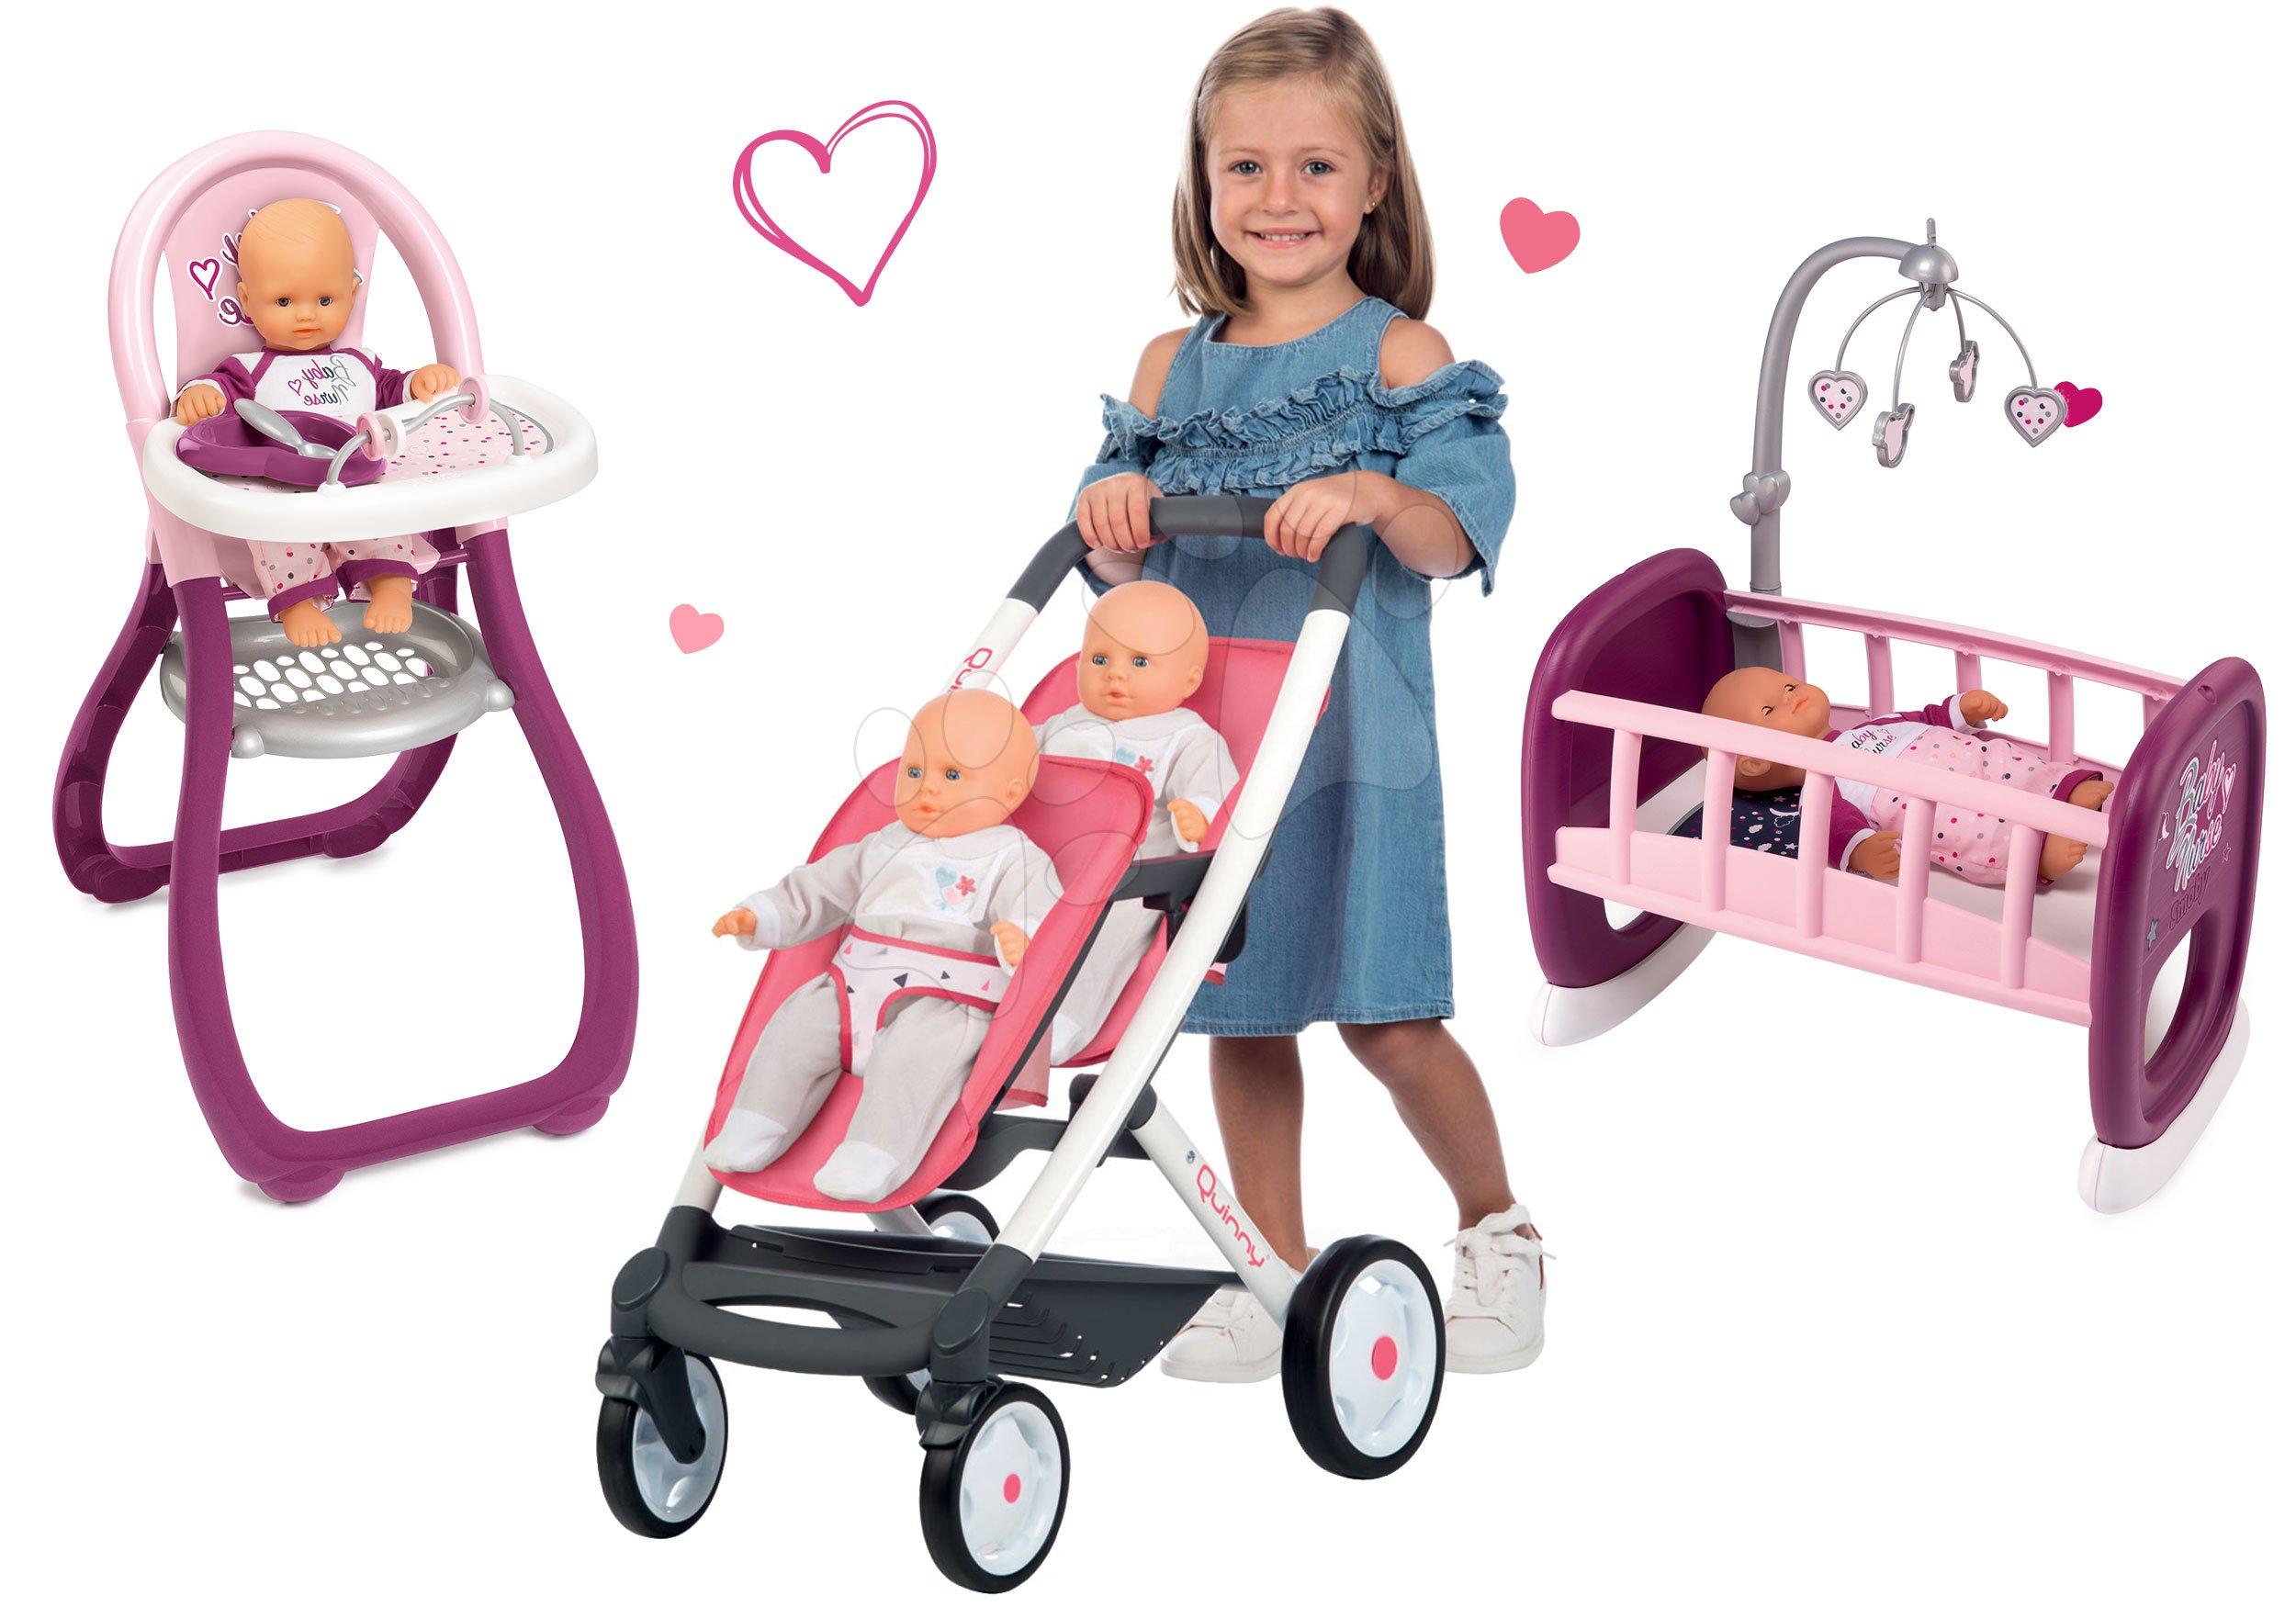 Set kočík pre dve bábiky Twin Trio Pastel Maxi Cosi & Quinny Smoby a jedálenská stolička s kolískou